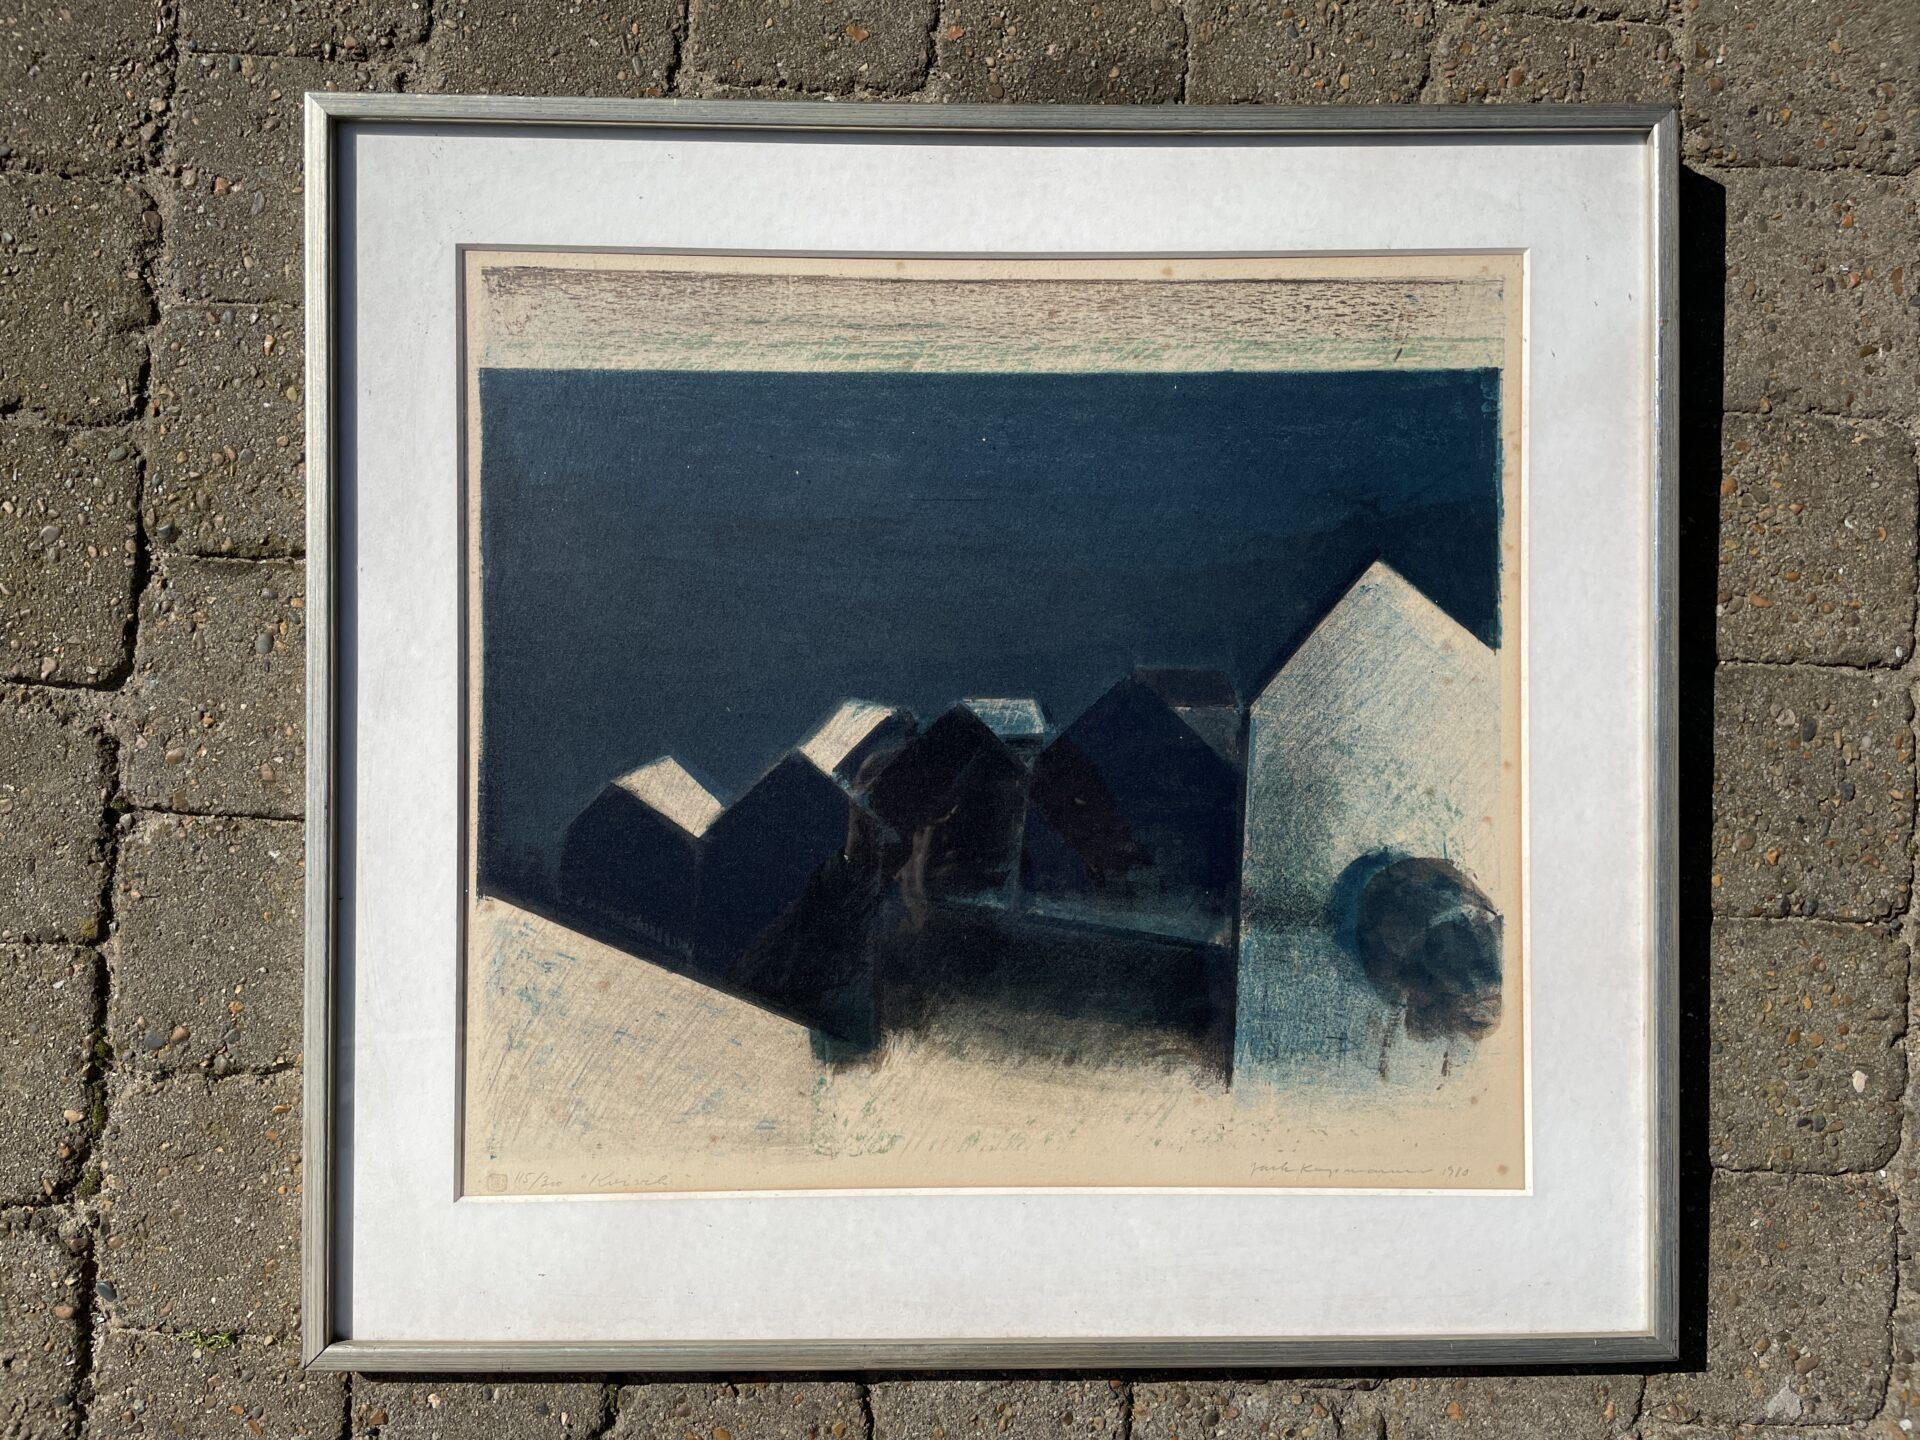 Jack Kampmann, litografi, nr 115/300 signeret i 1980 (Kvivik), rammemål 72x67 cm.